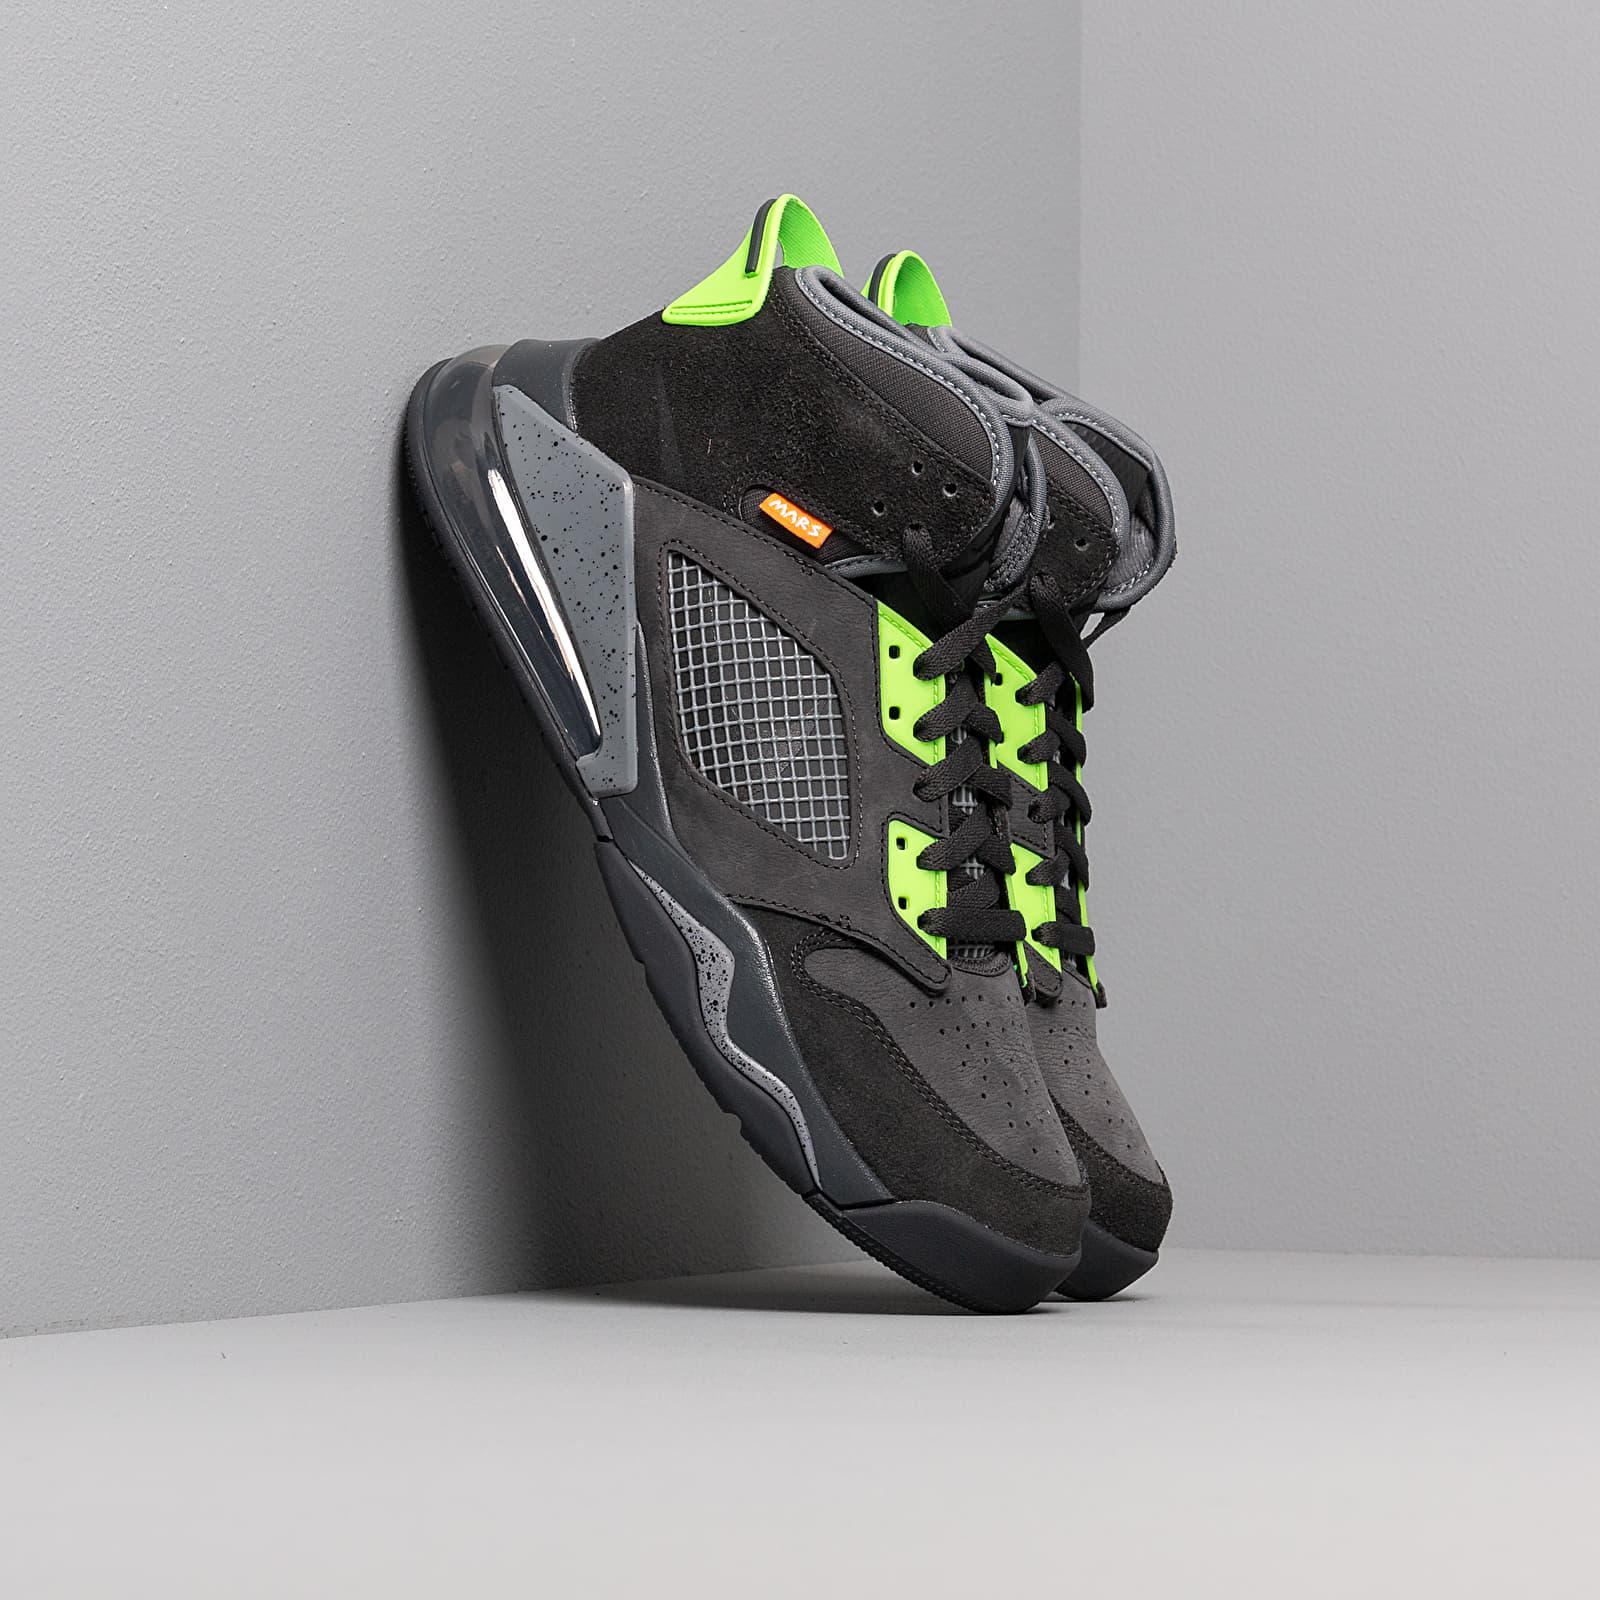 Men's shoes Jordan Mars 270 Anthracite/ Black-Electric Green